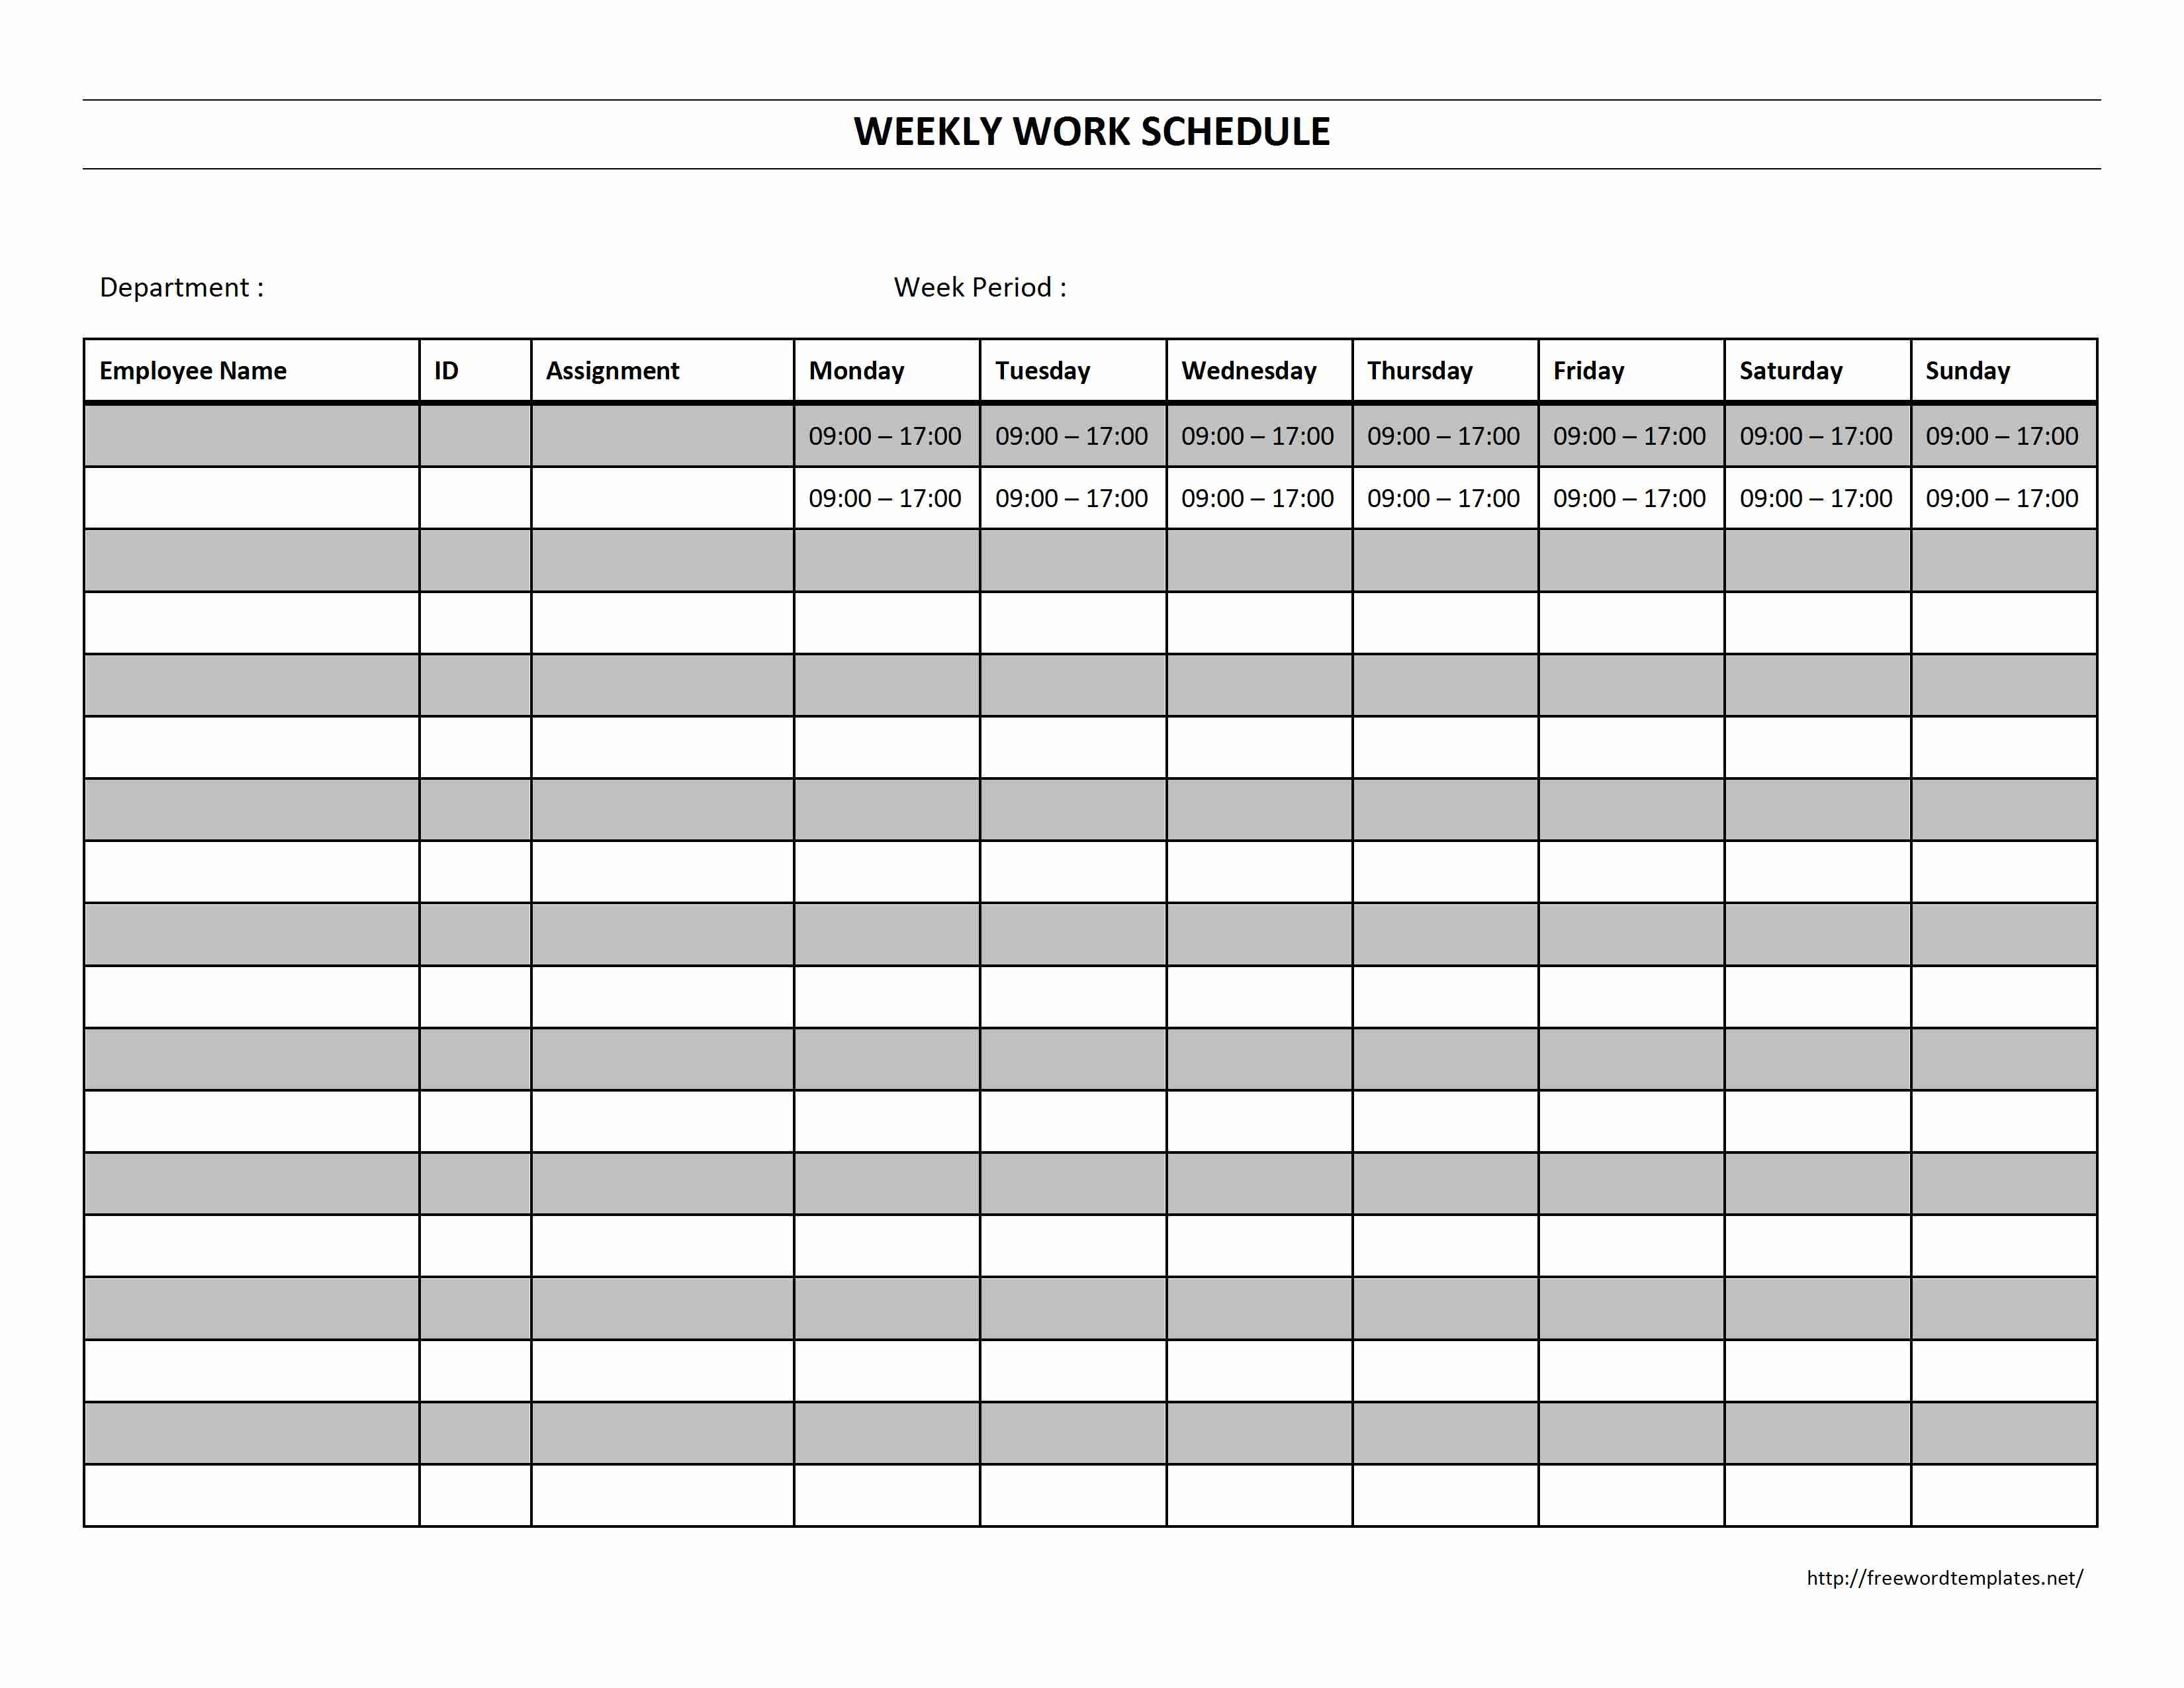 Work Schedule Maker Template Plan Tools4Dev | Smorad - Free Printable Work Schedule Maker